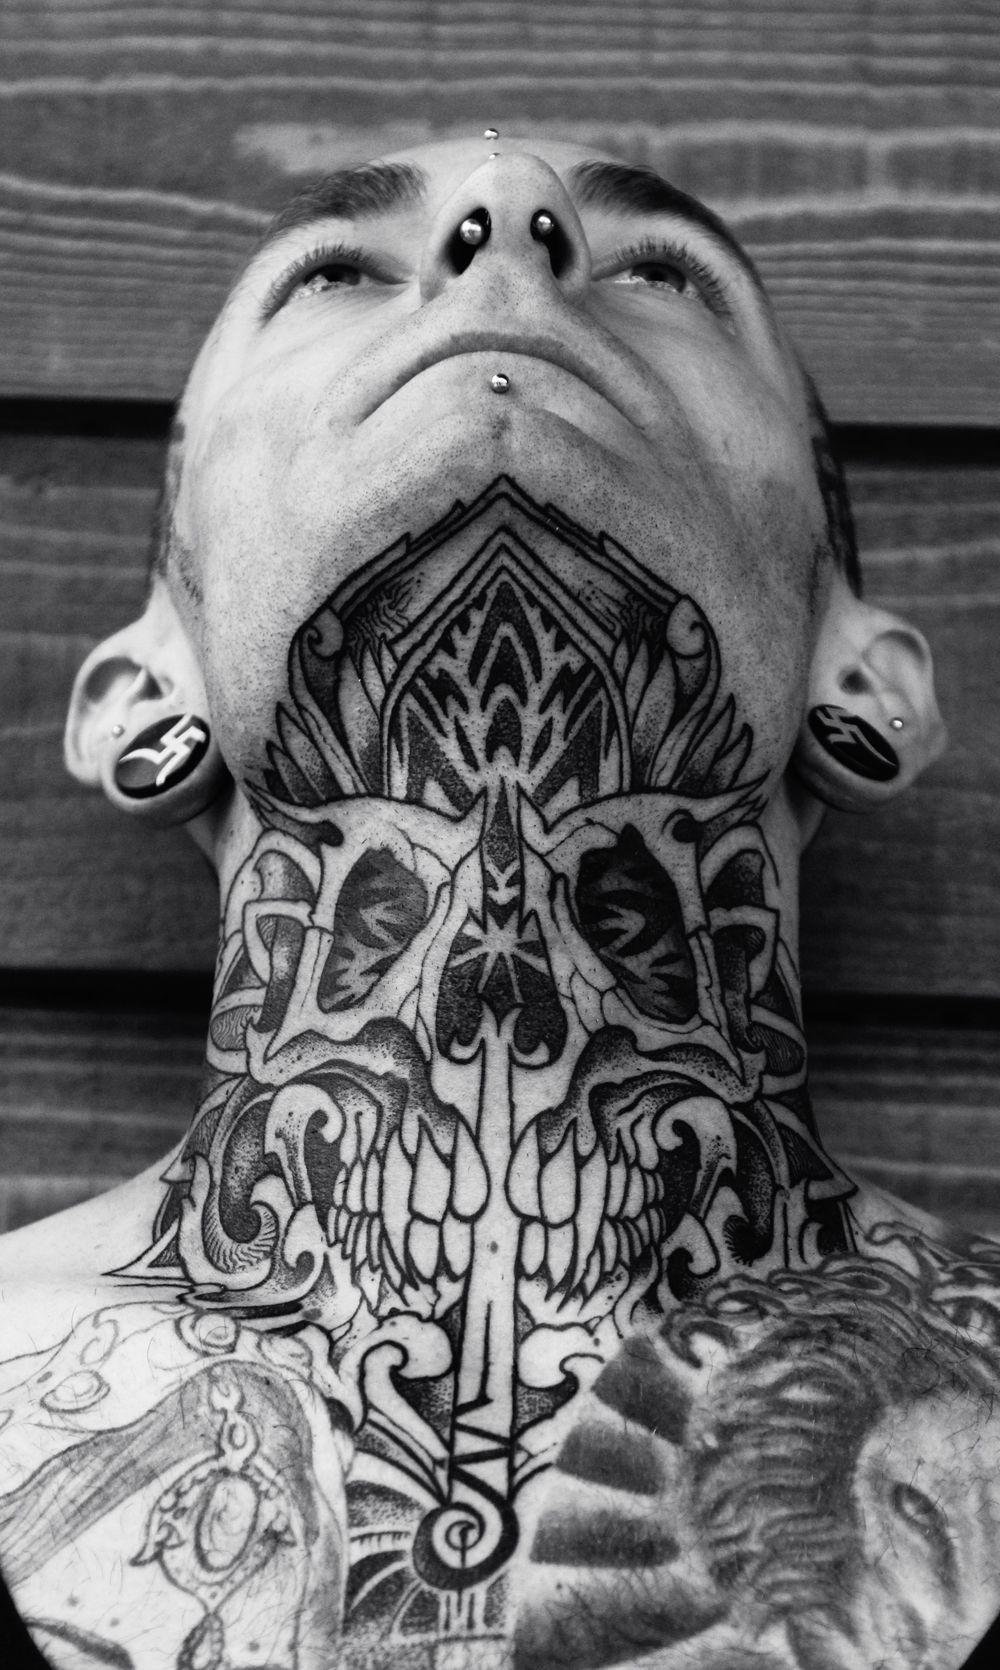 Skull Mandala Neck Piece Neck Tattoo For Guys Front Neck Tattoo Wing Neck Tattoo